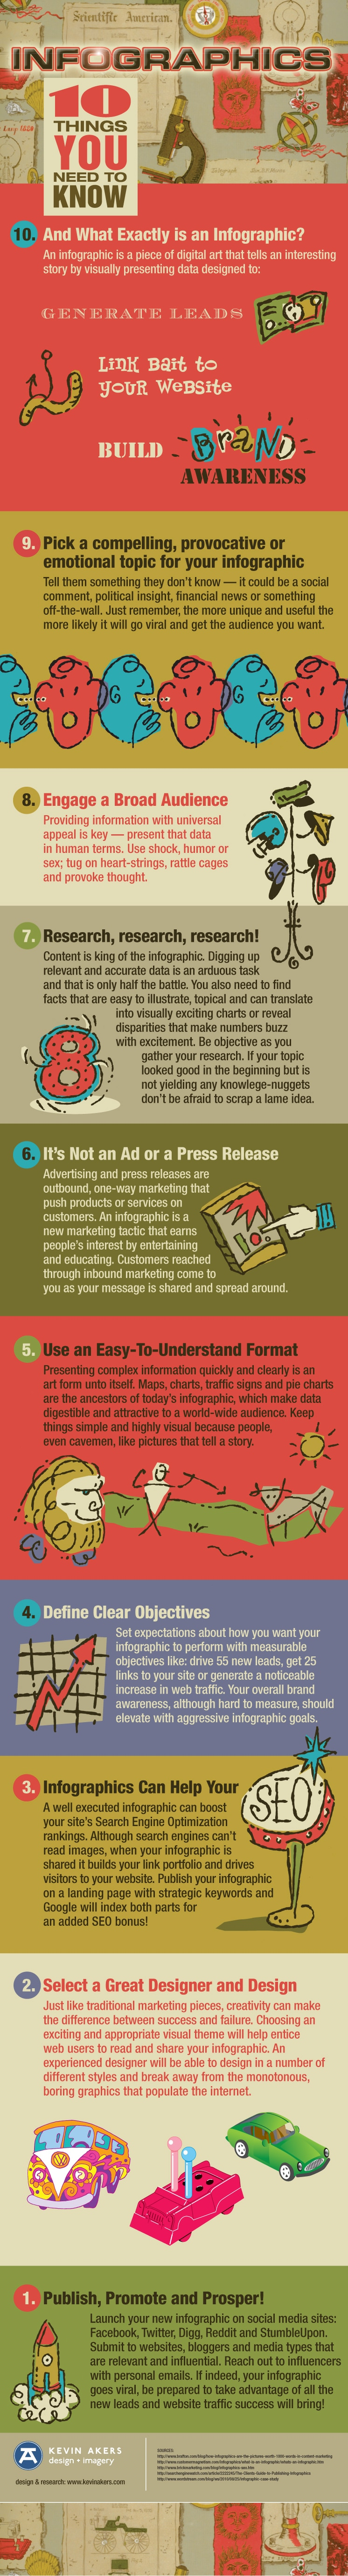 infographic-design-vital-elements-infographic